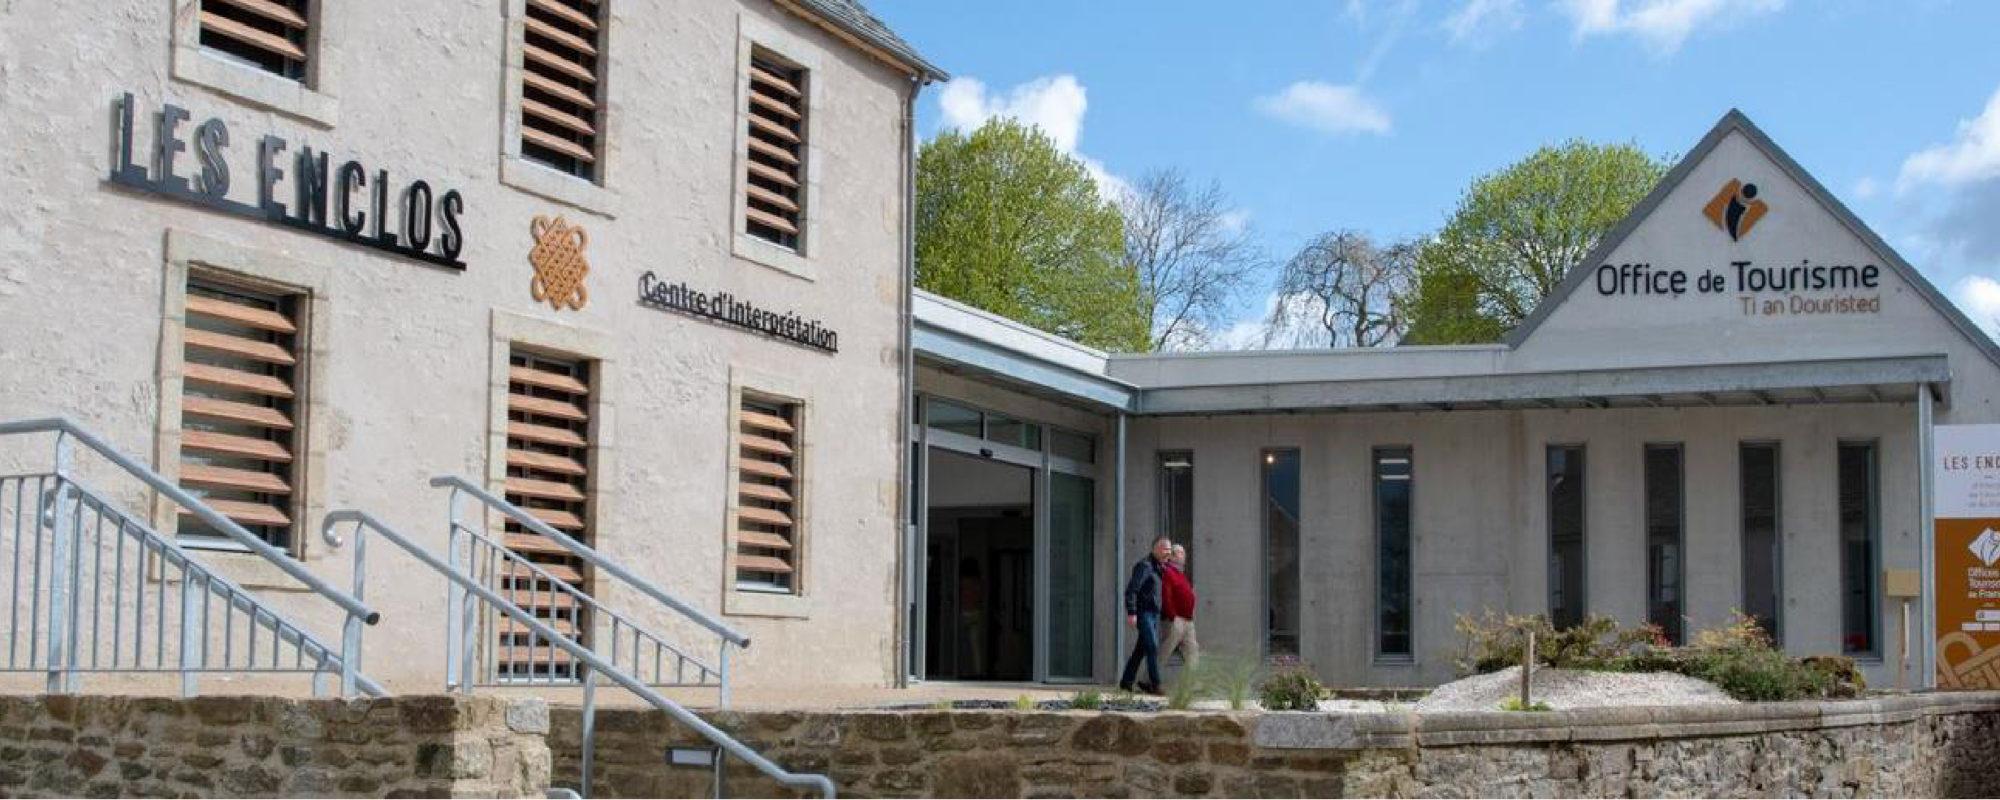 The parish close interpretation centre